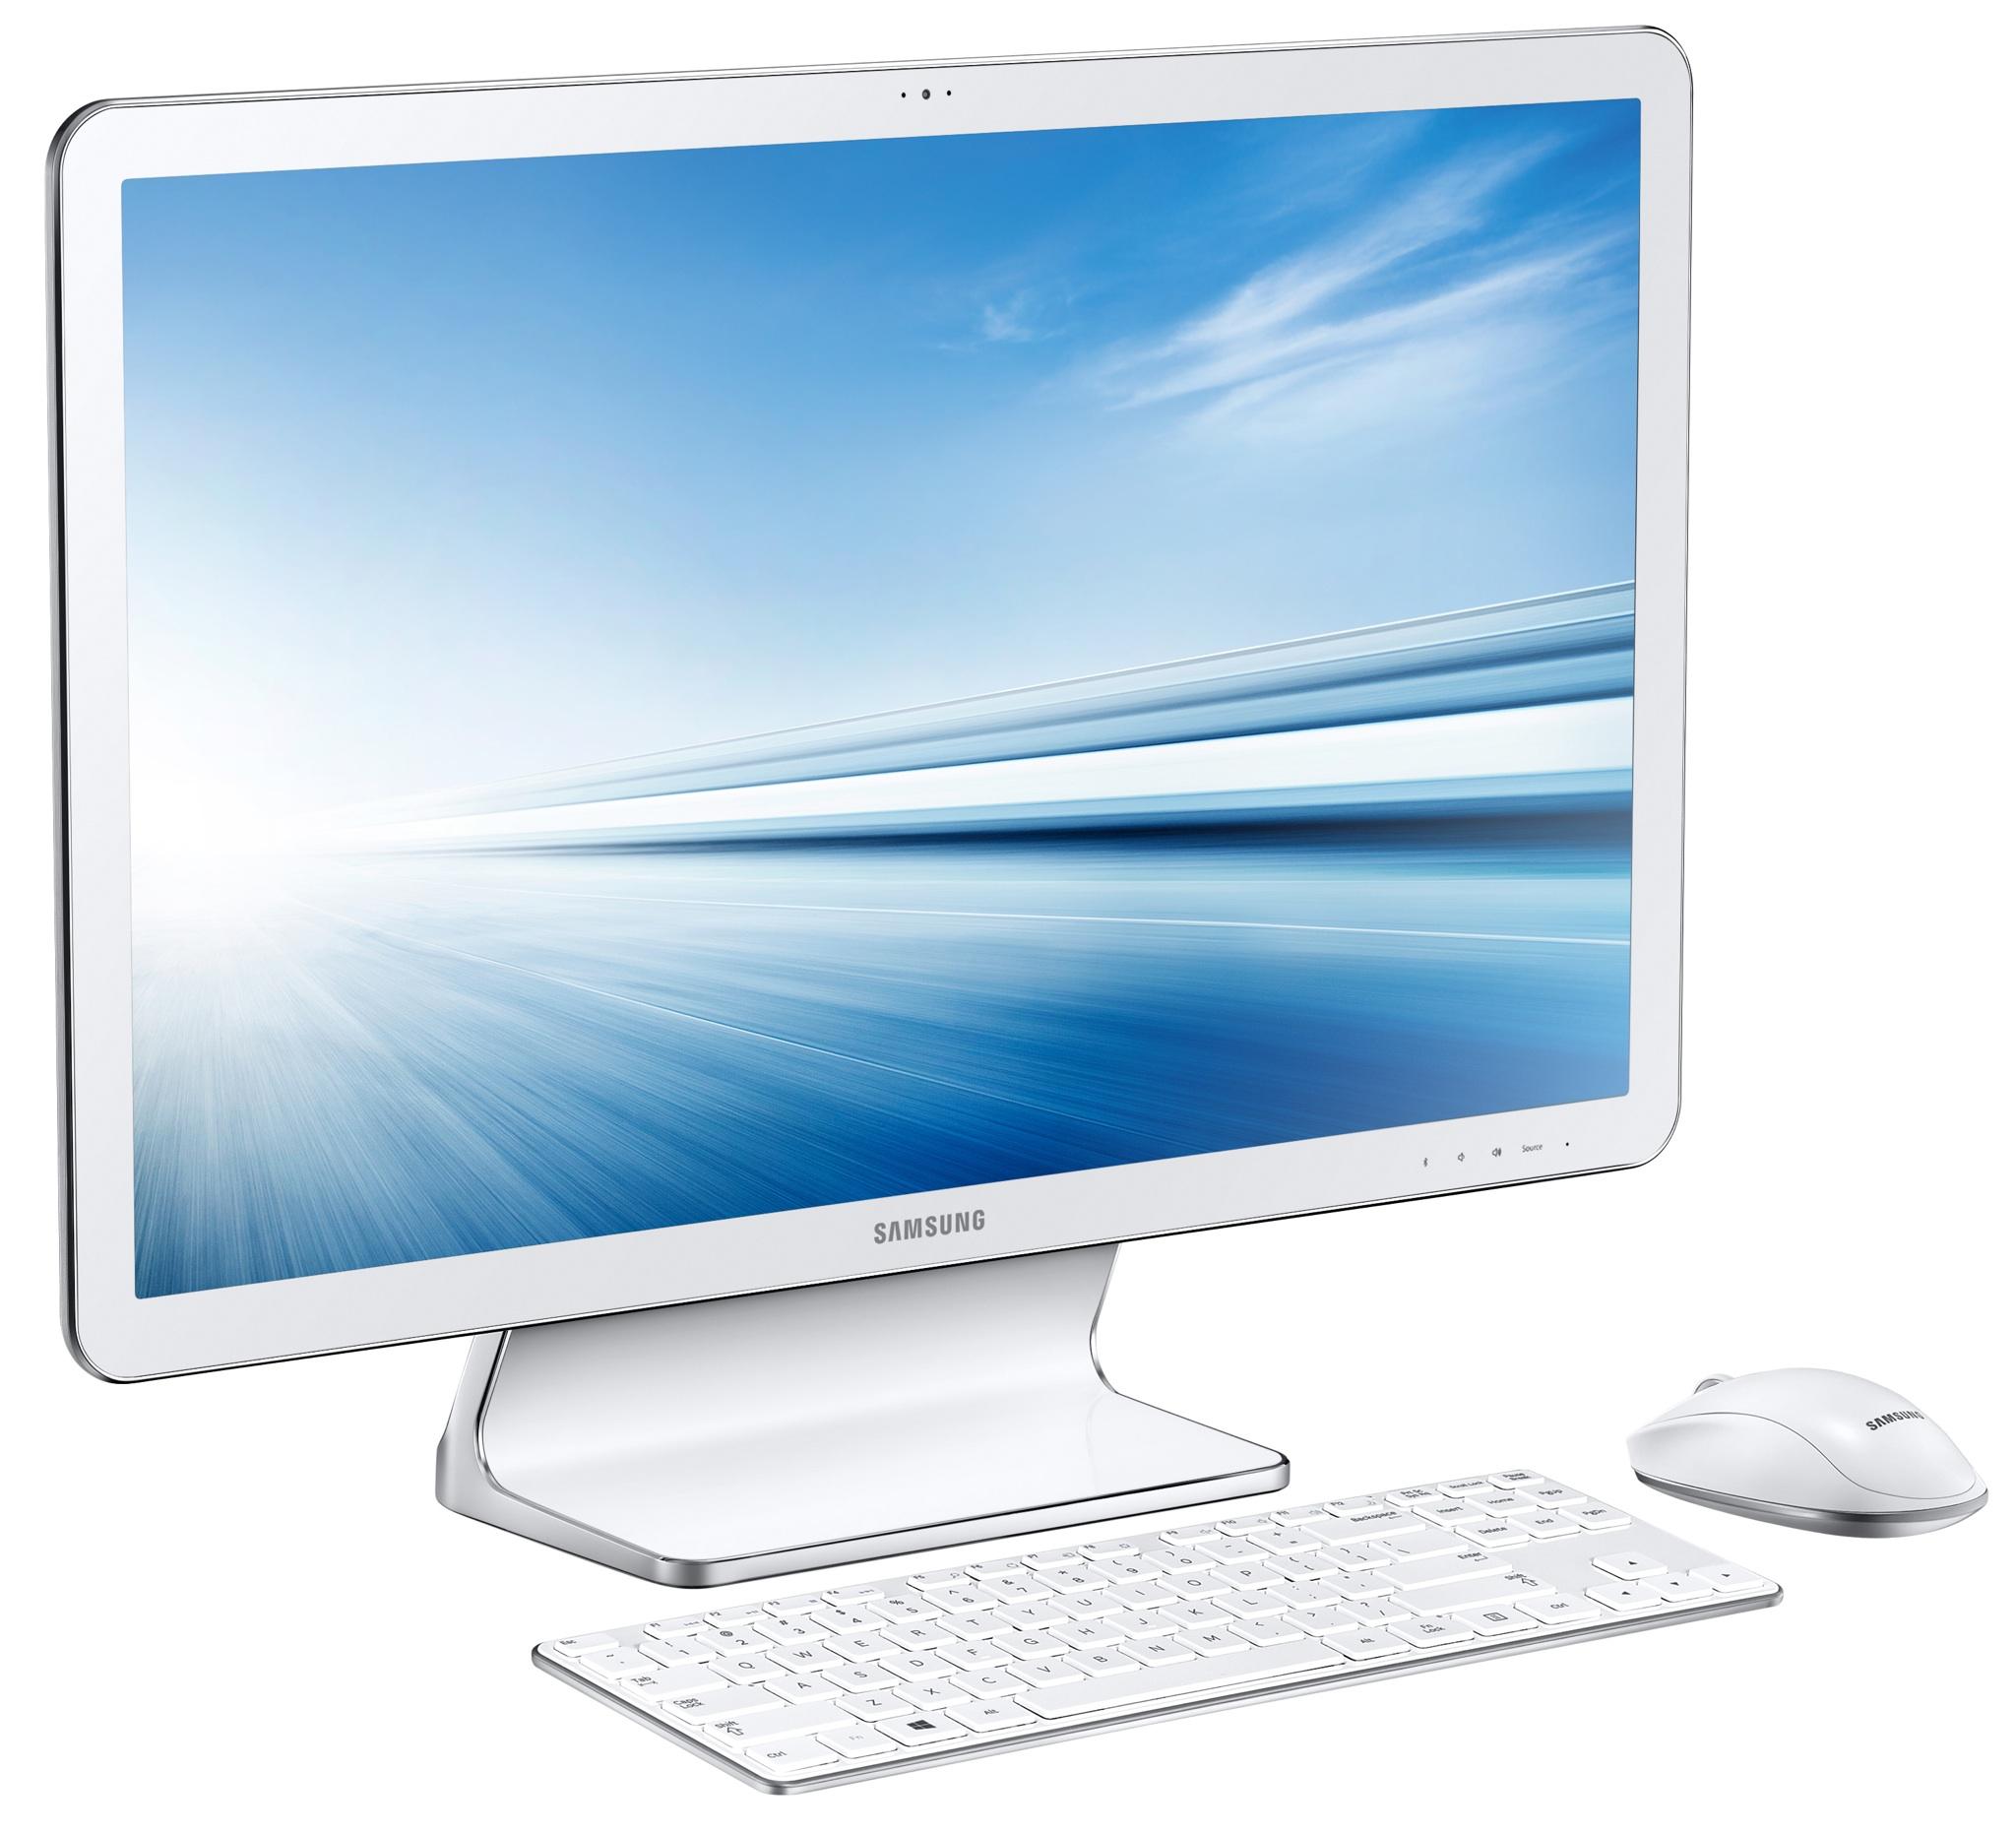 Samsung Ativ One 7 (image 001)